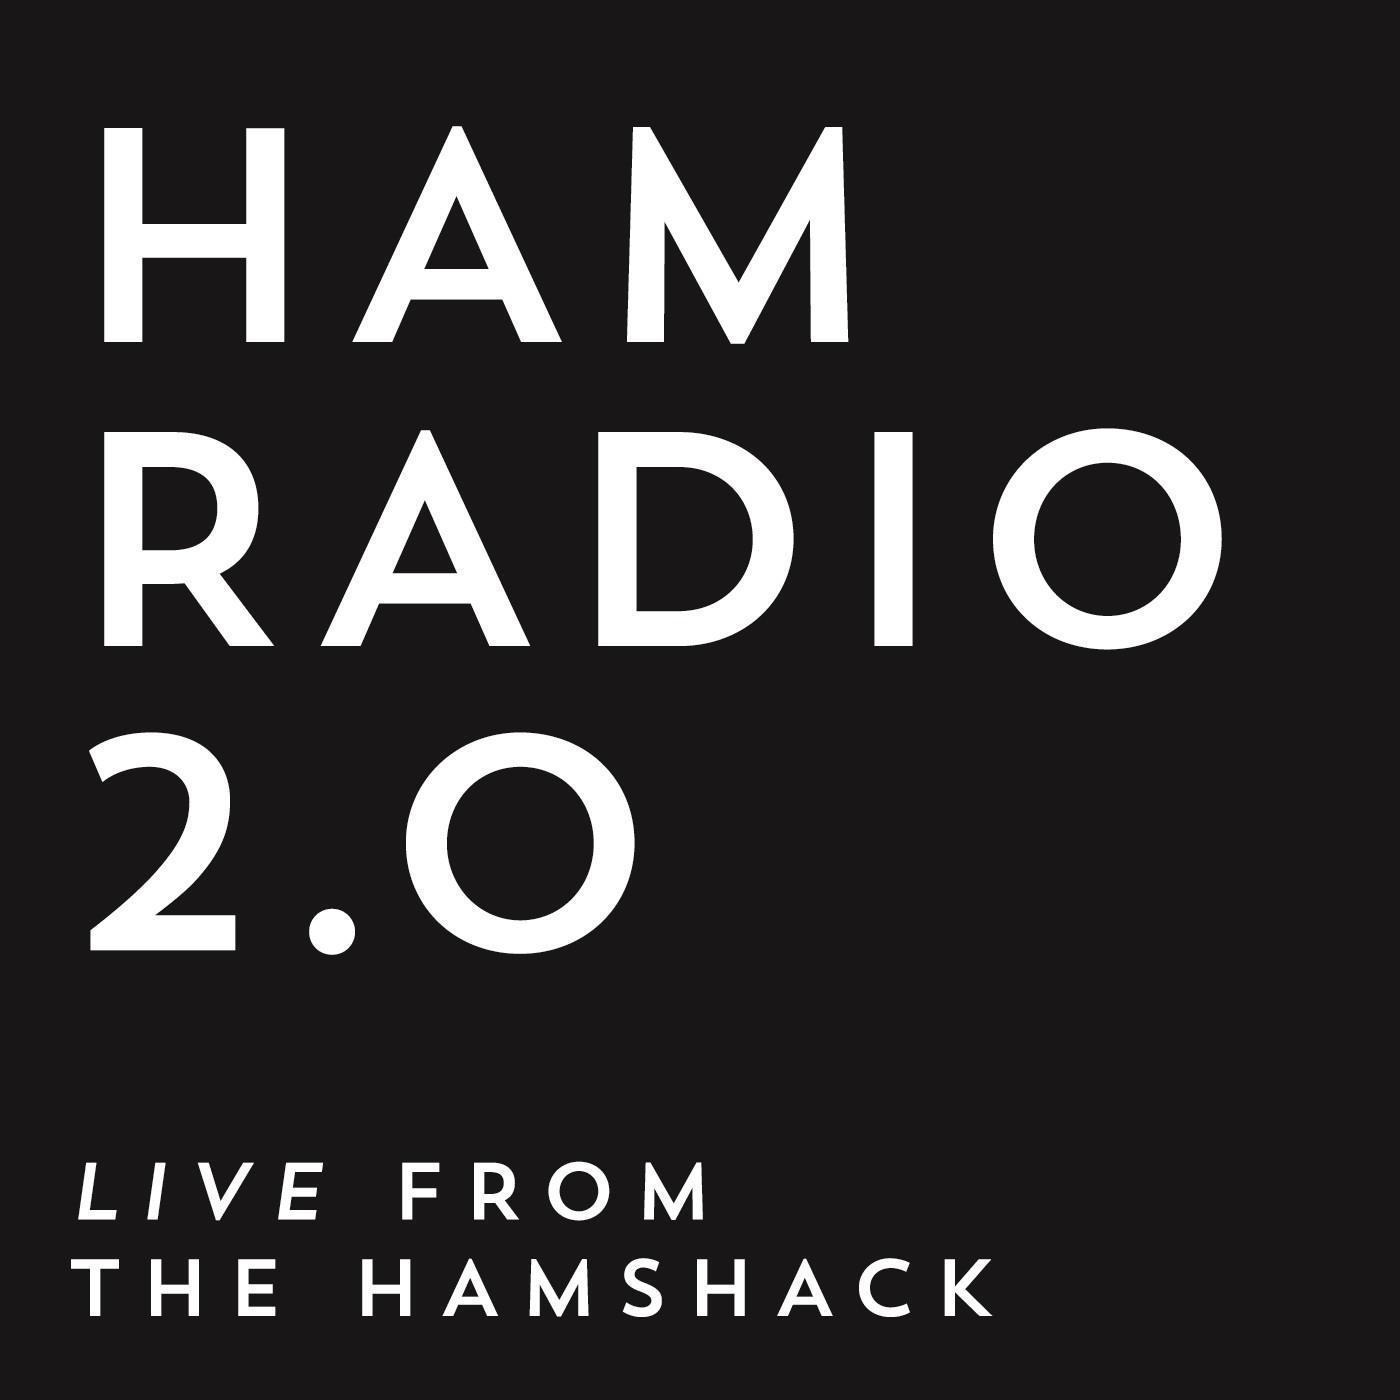 Ham Radio 2 0 (podcast) - Jason Johnston - KC5HWB | Listen Notes